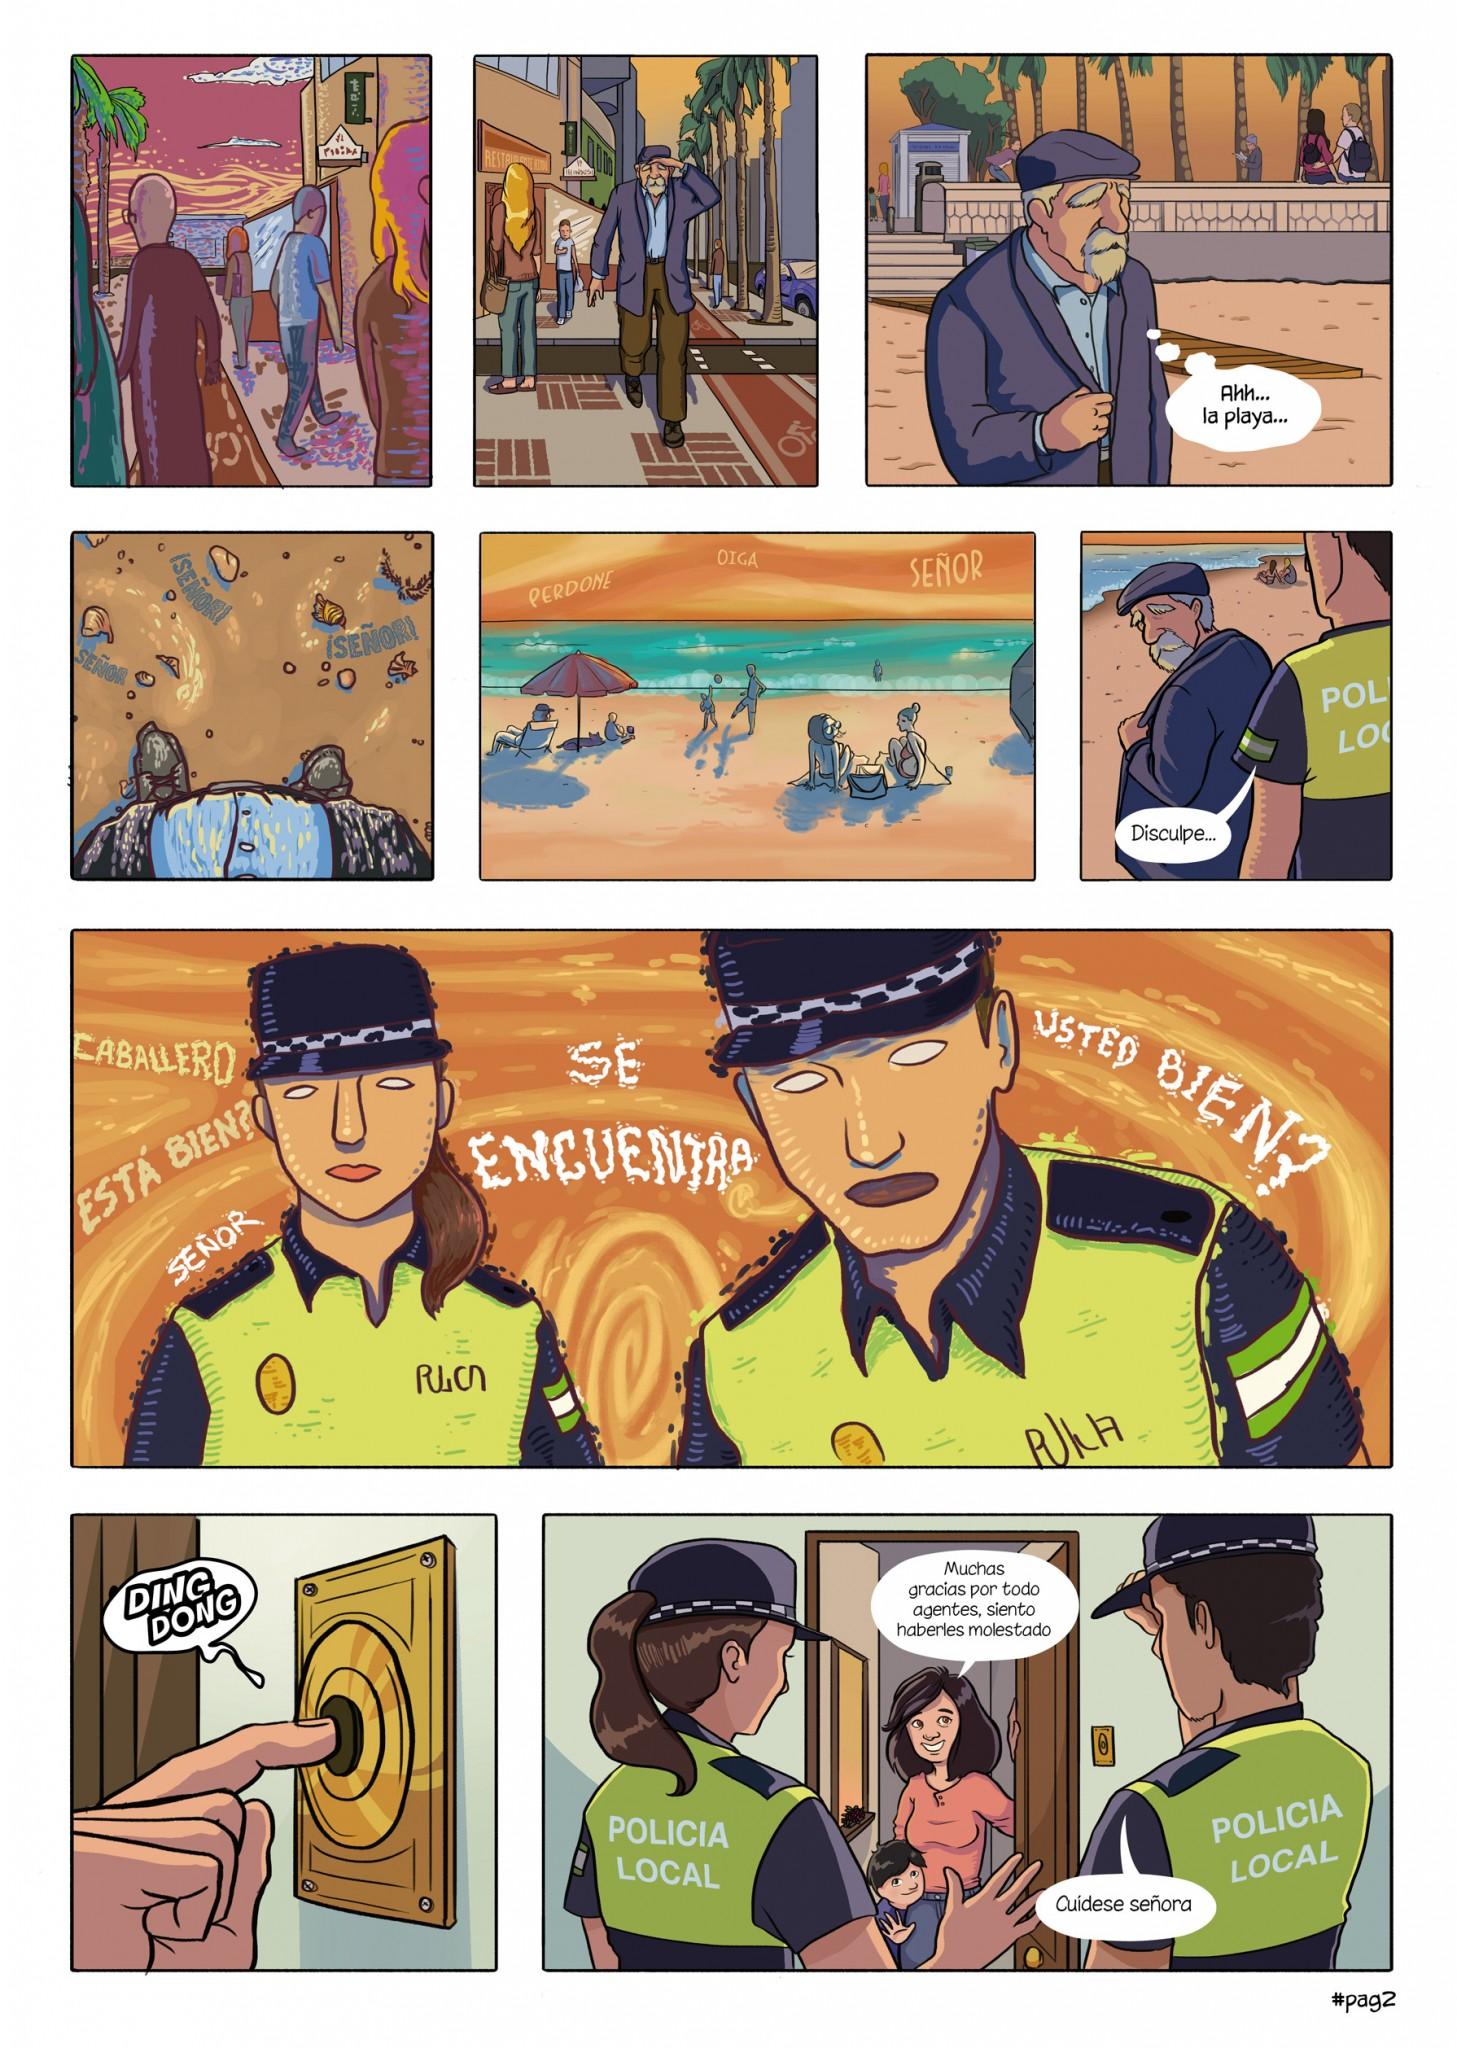 Pagina comic 02